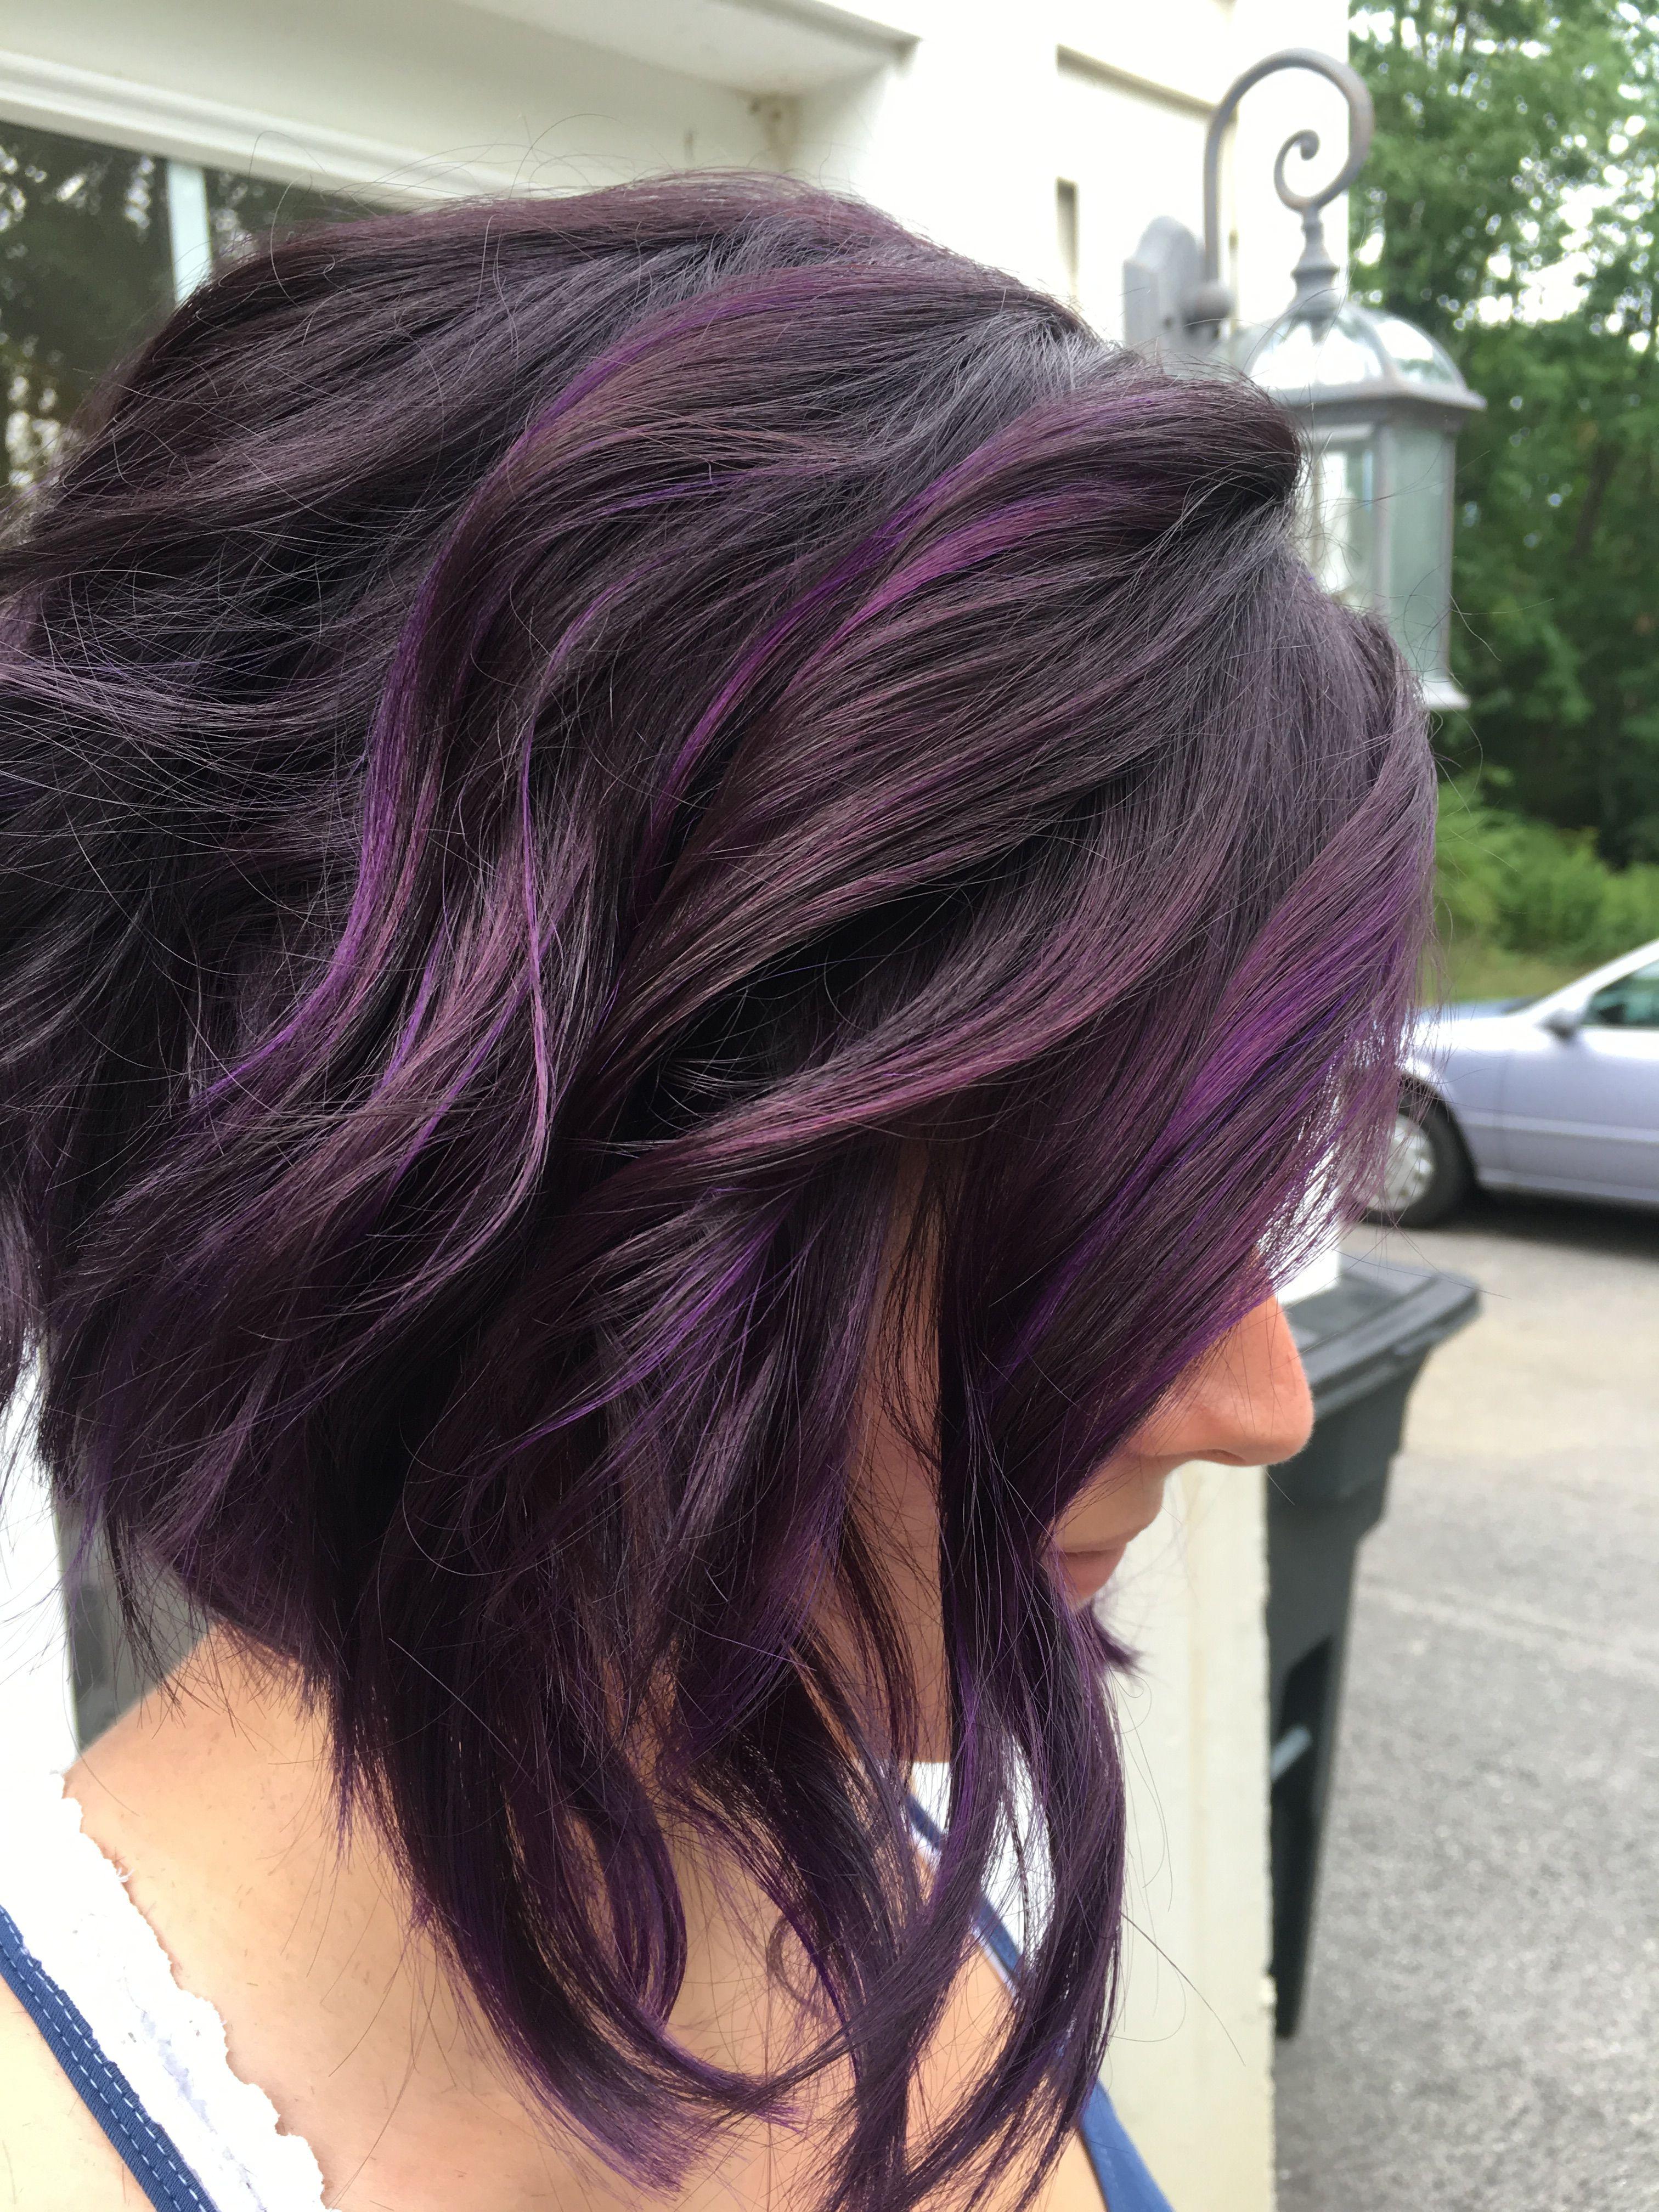 Pravana Violet And Wild Orchid Hair Hair Hair Hair Violet Hair